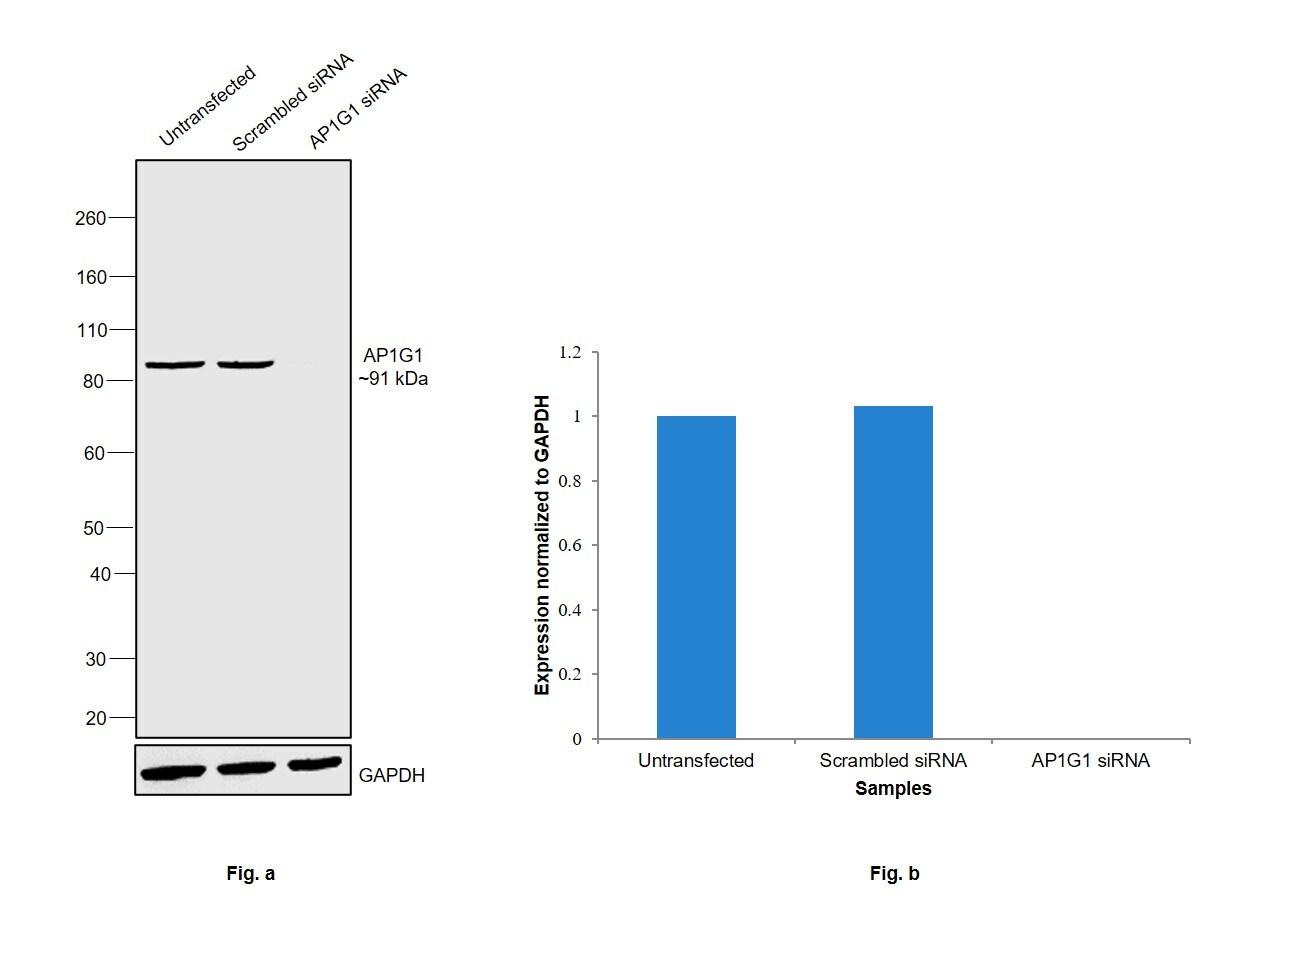 gamma Adaptin Antibody in Knockdown